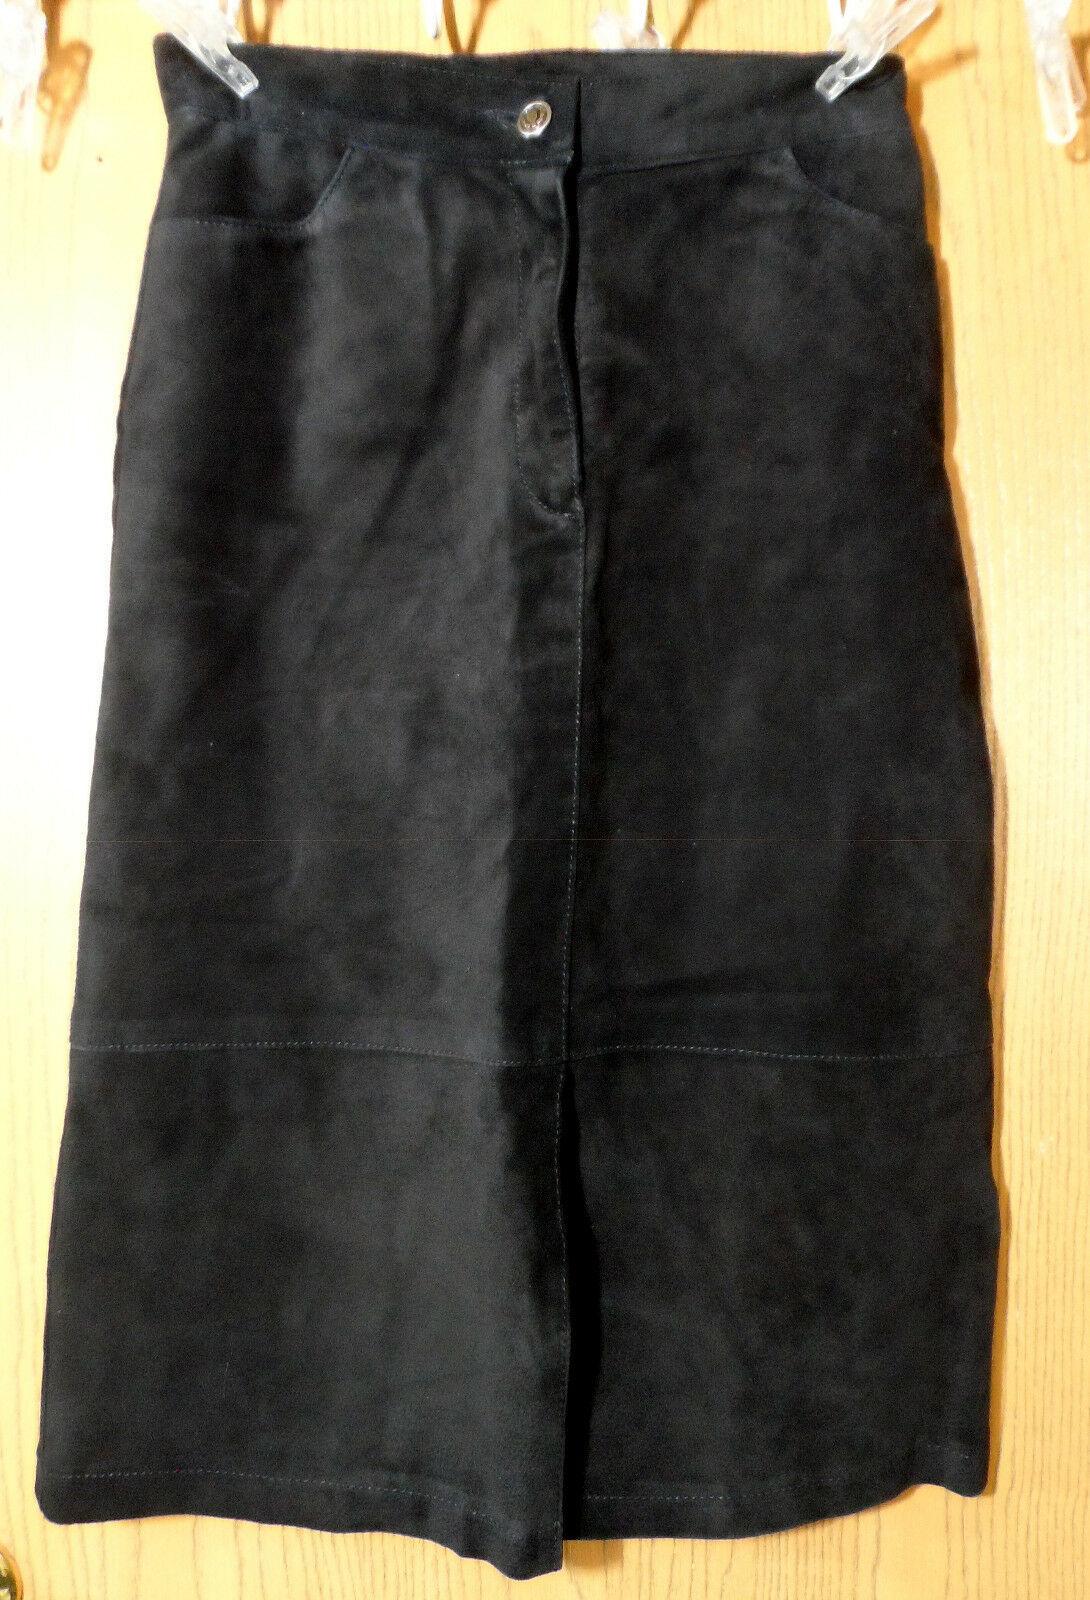 SKOTTS SUEDE Washable Leather Skirt sz 4 Black Midi Straight pencil fit Canadian